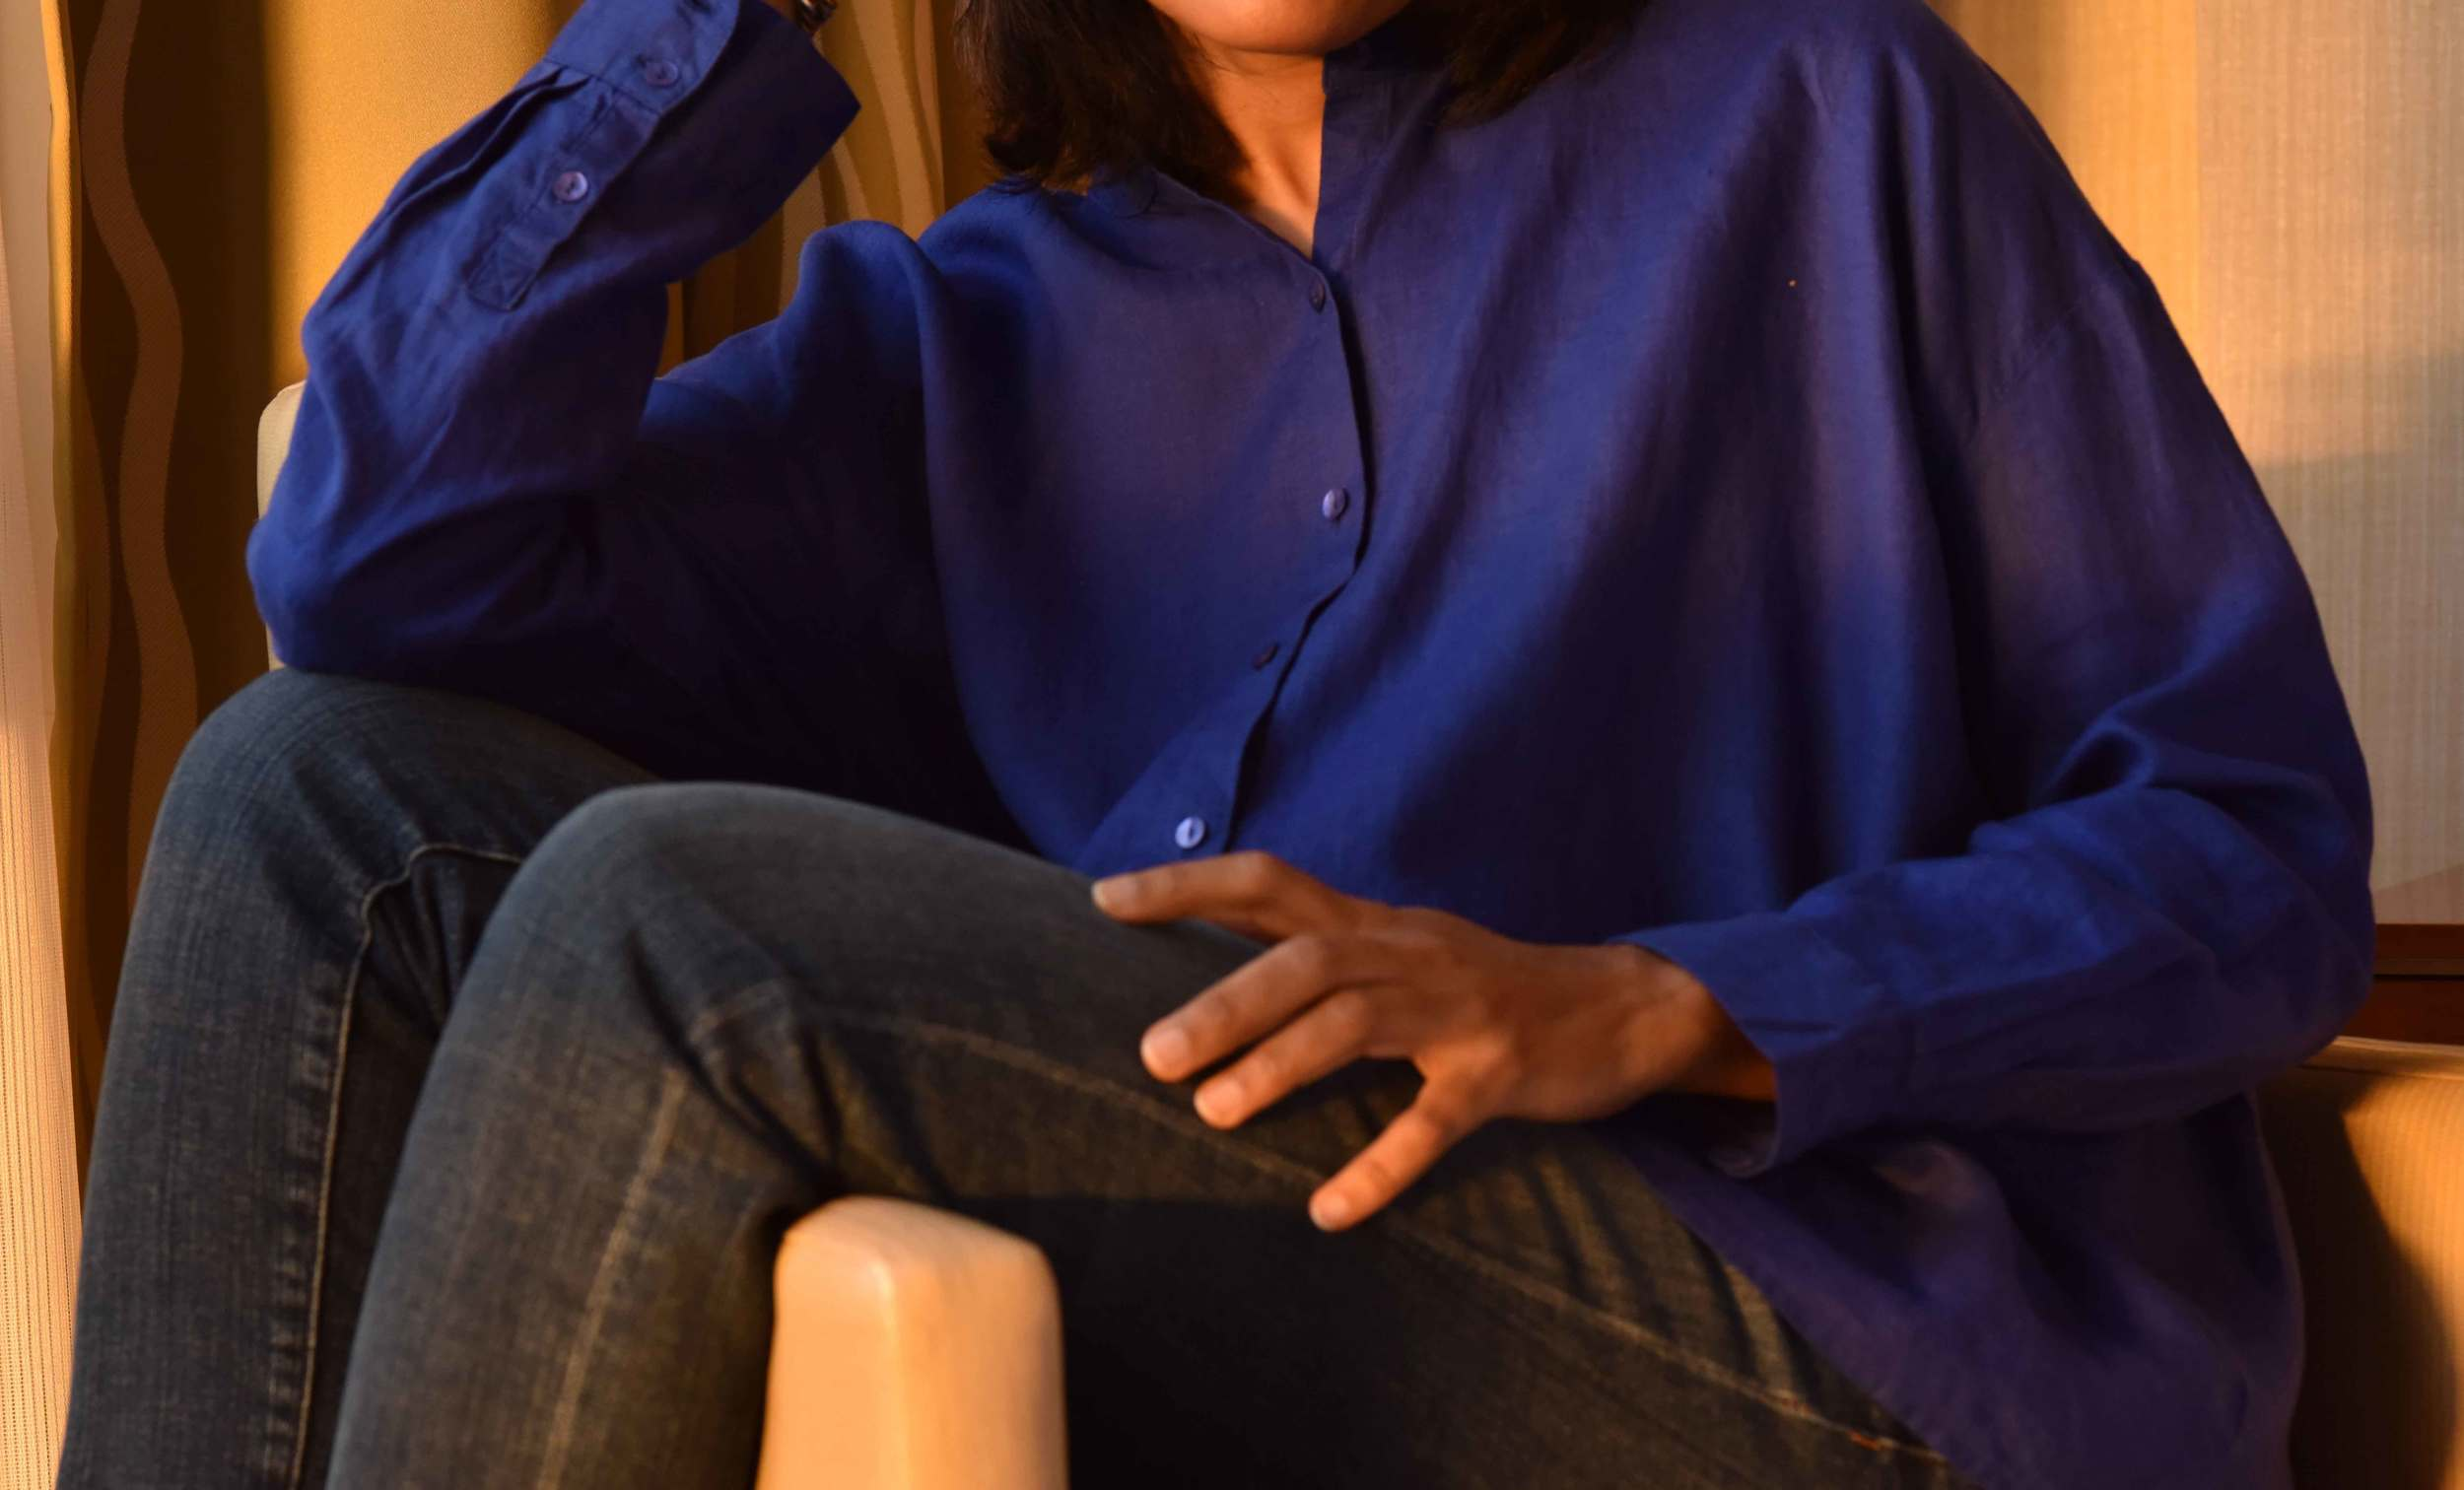 Eileen Fisher Mandarin Collar Shirt in Handkerchief Linen and Eileen Fisher Boyfriend Jeans.Image©gunjanvirk,